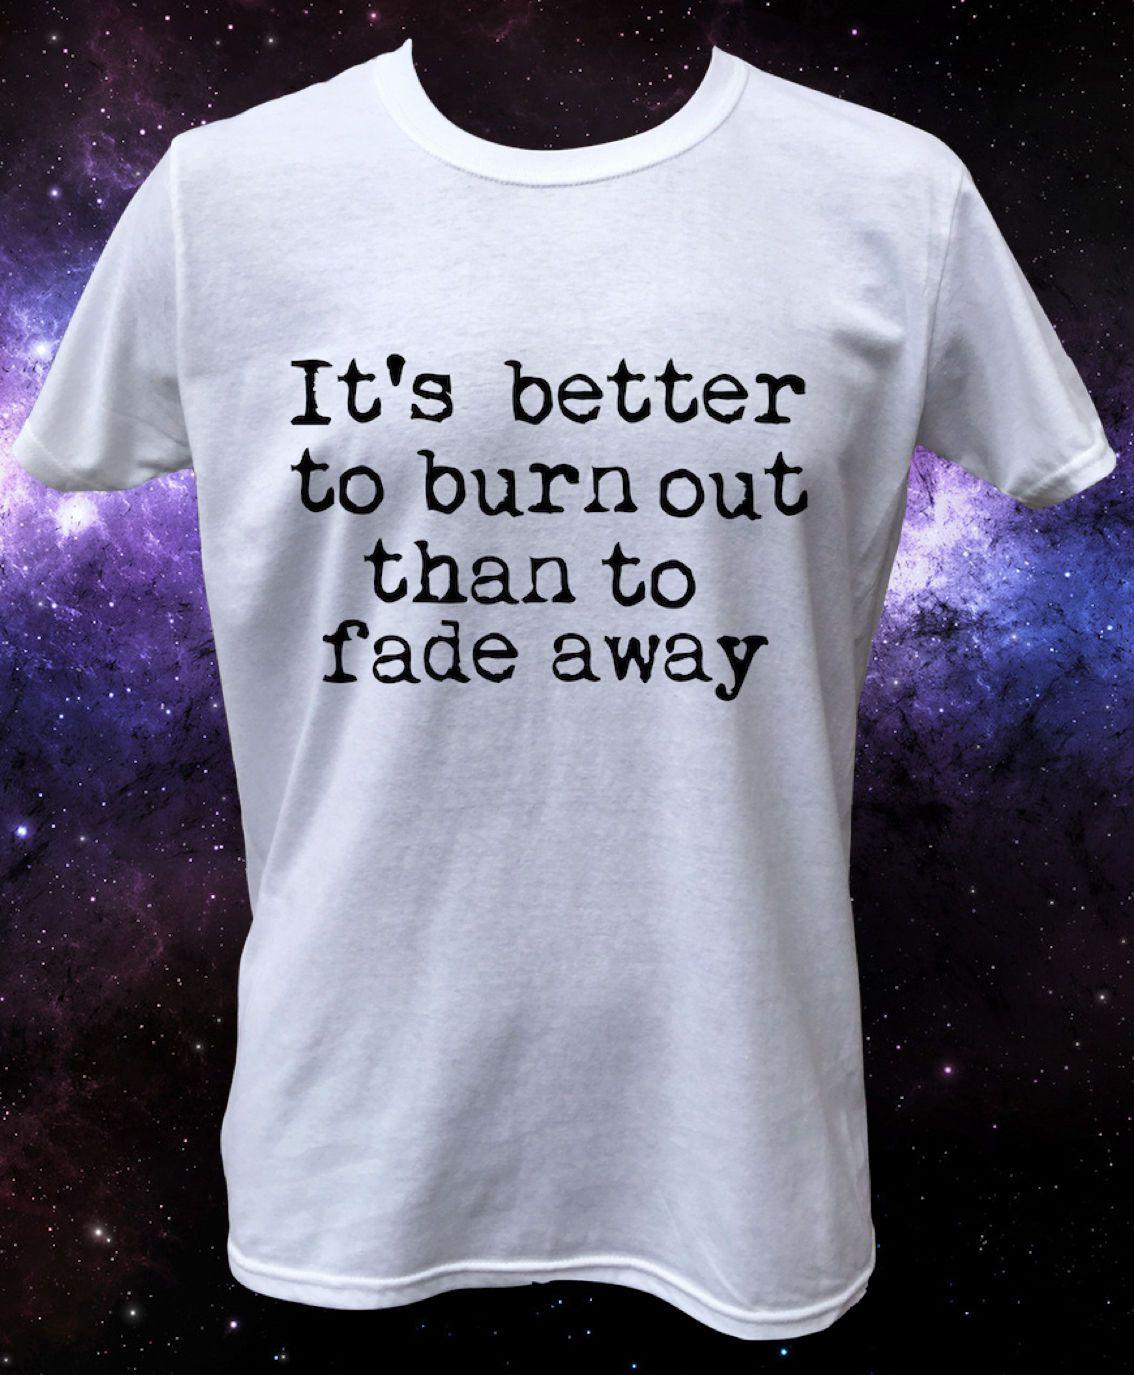 Black t shirt grunge - Click To Buy Kurt Cobain Quote Burn Out Grunge Rock T